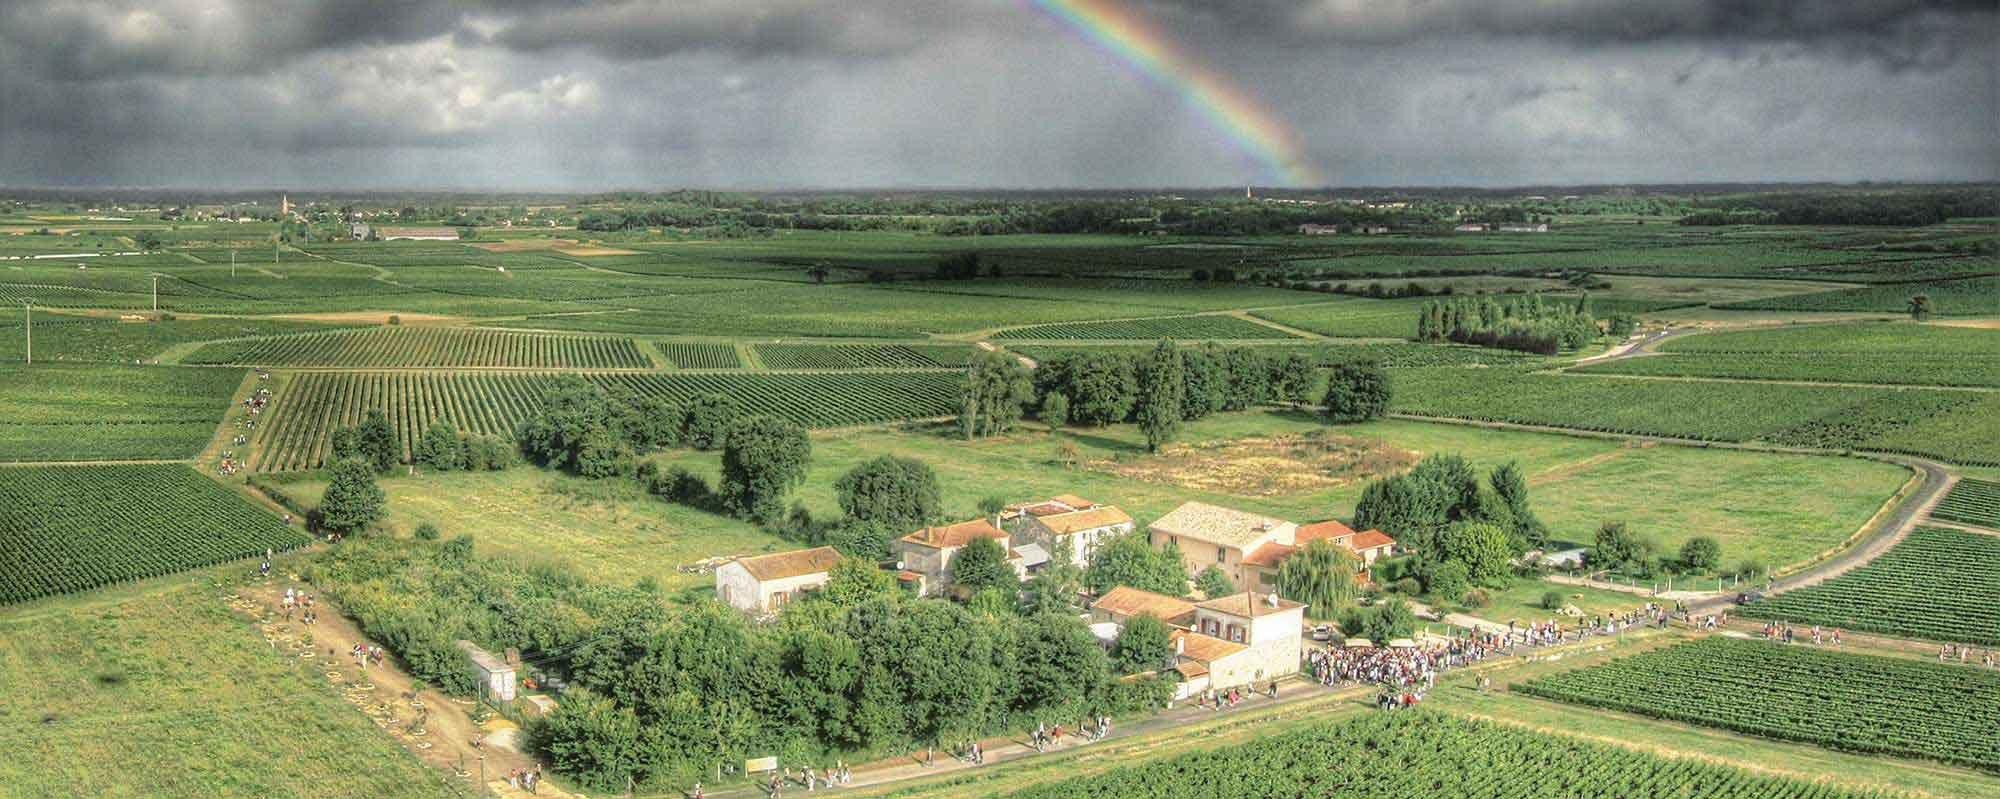 Visiter atelier de confiserie en Gironde